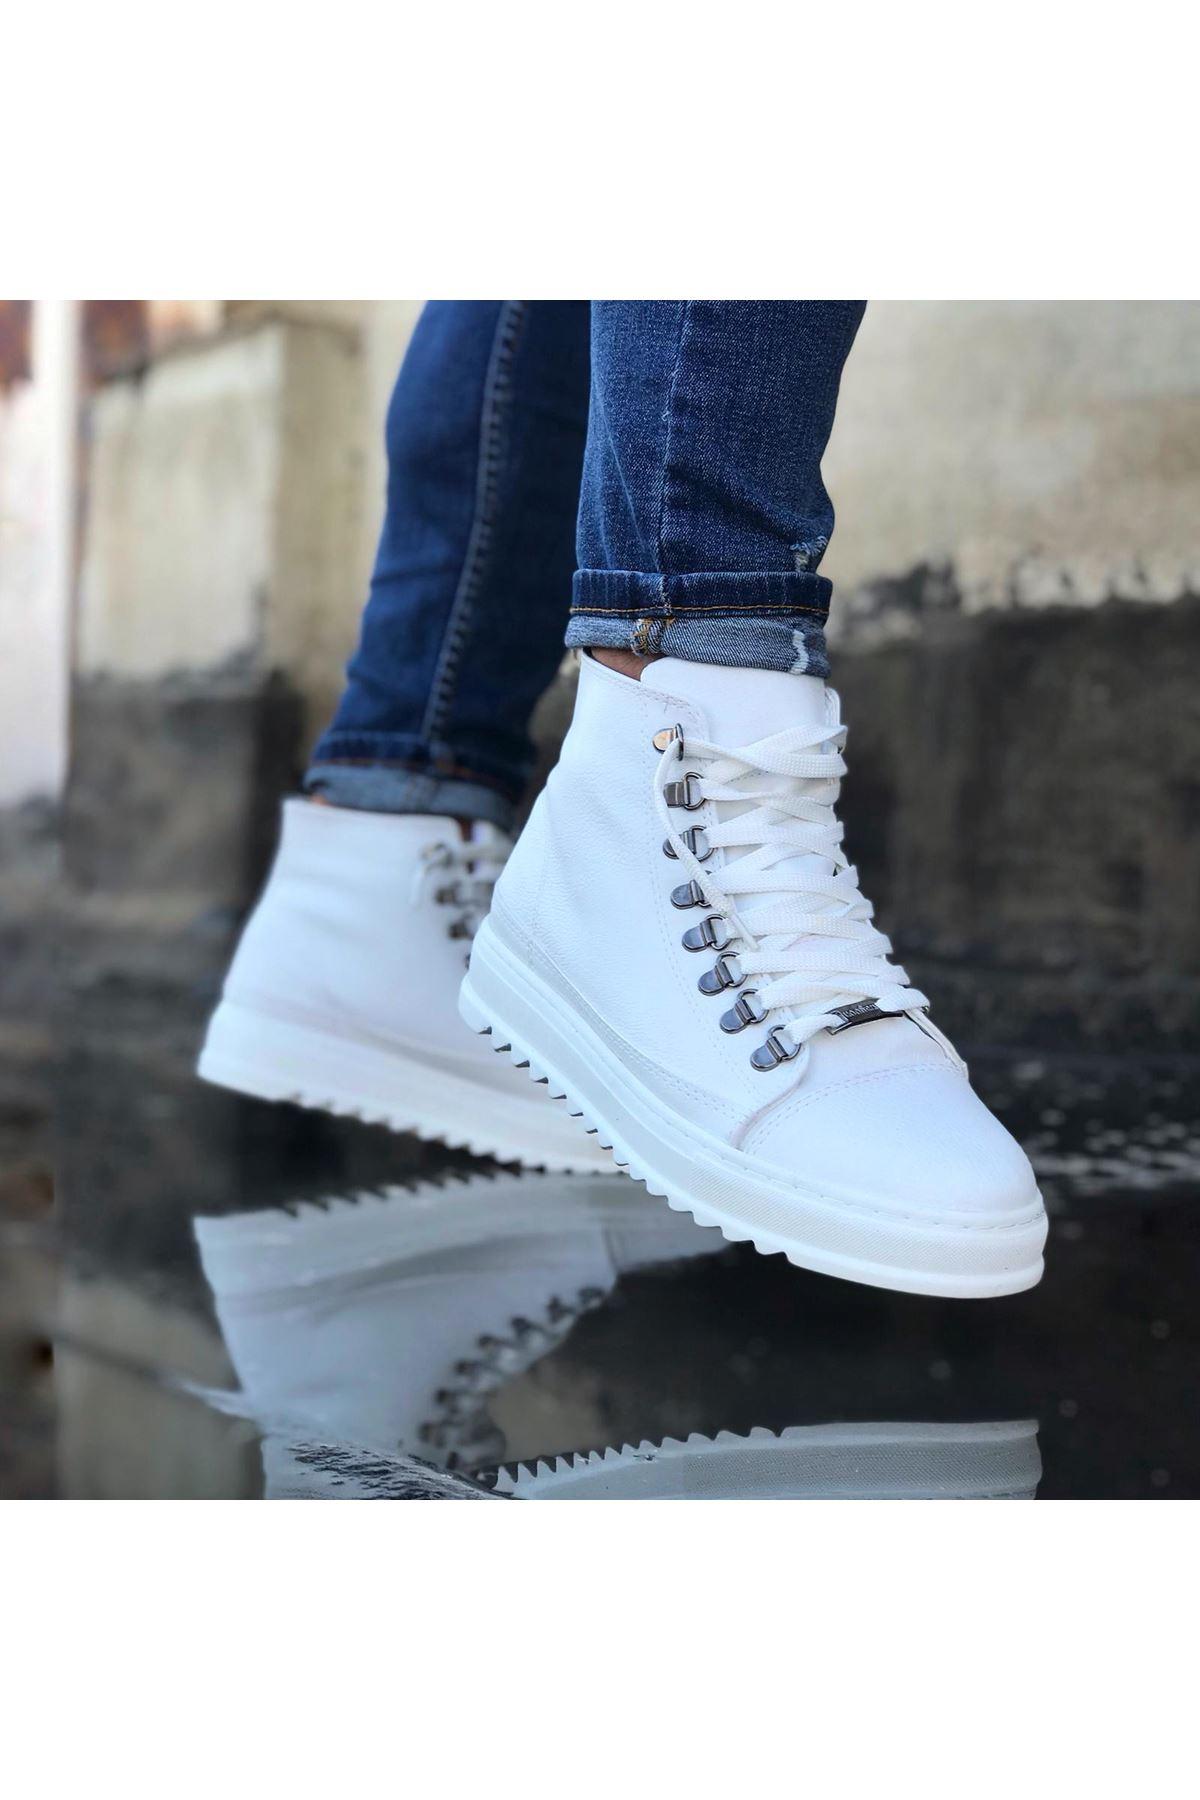 Wagoon WG034 Beyaz Bağcıklı Sneakers  Yarım Bilek Bot